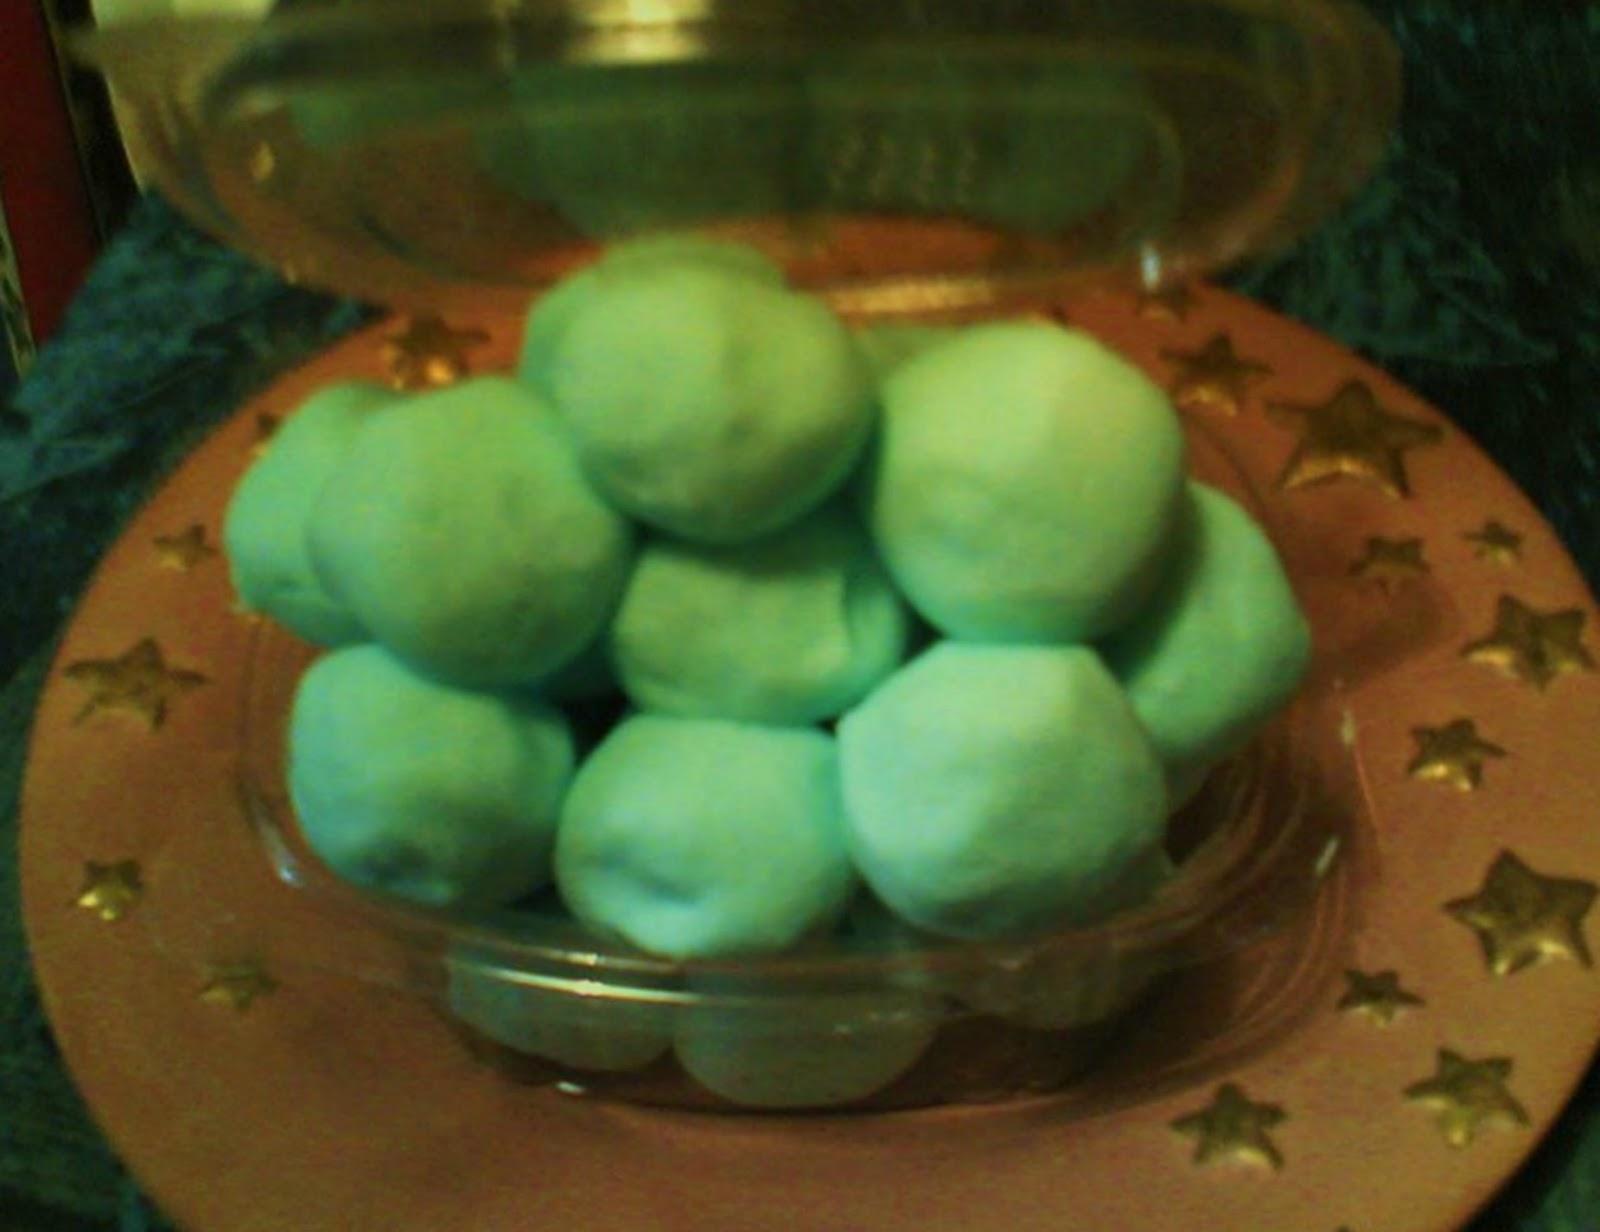 Perle da bagno rilassanti fai da te donneinpink magazine - Perle da bagno sephora ...